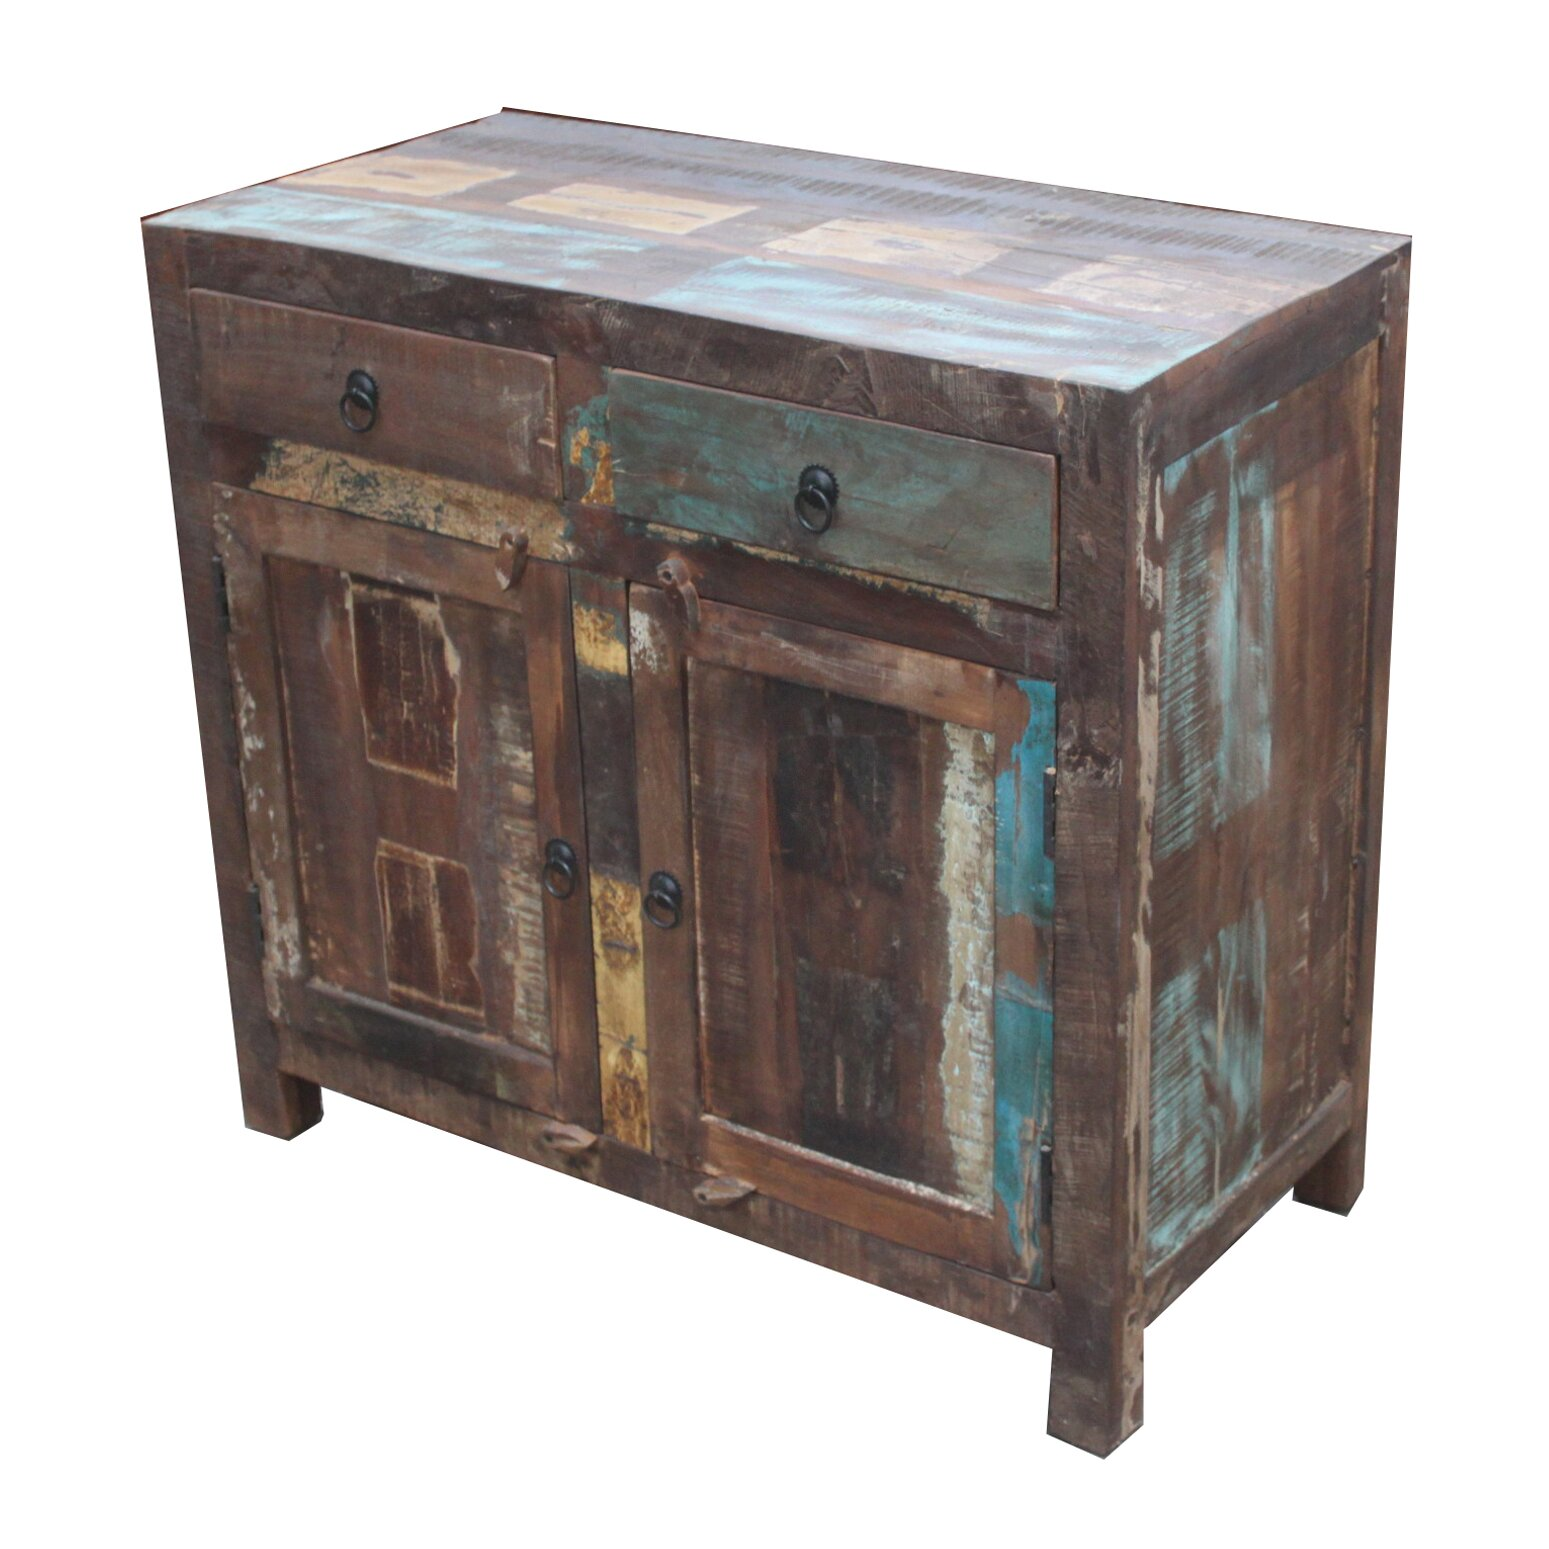 Reclaimed Wood 2-Door 2 Drawer Sideboard Cabinet - Timbergirl Reclaimed Wood 2-Door 2 Drawer Sideboard Cabinet